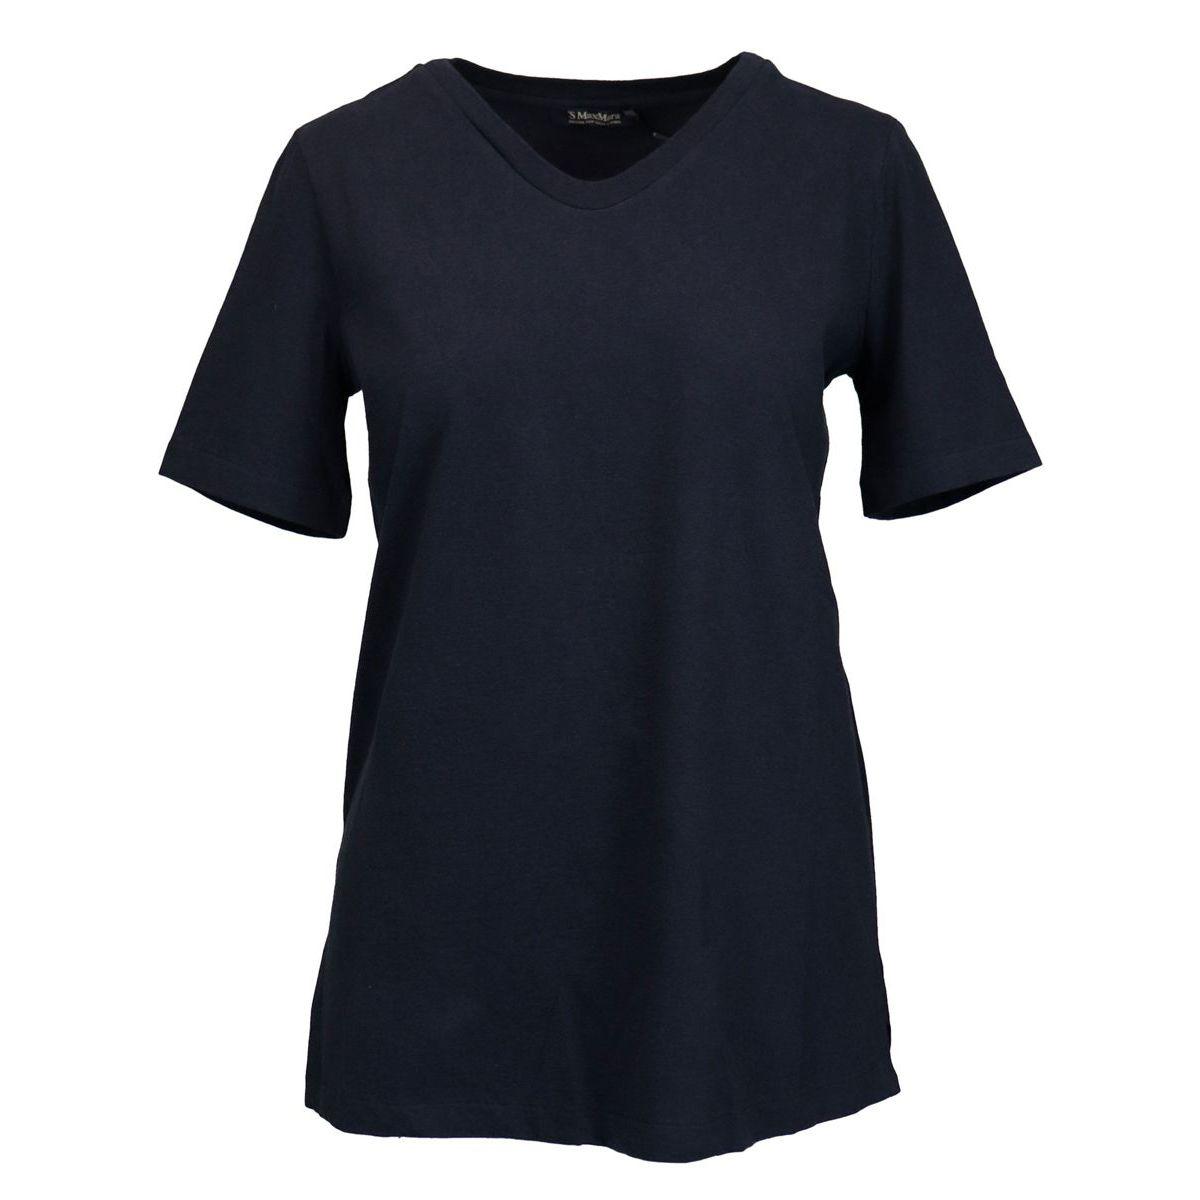 DELETTA short sleeve cotton t-shirt Blue Max Mara